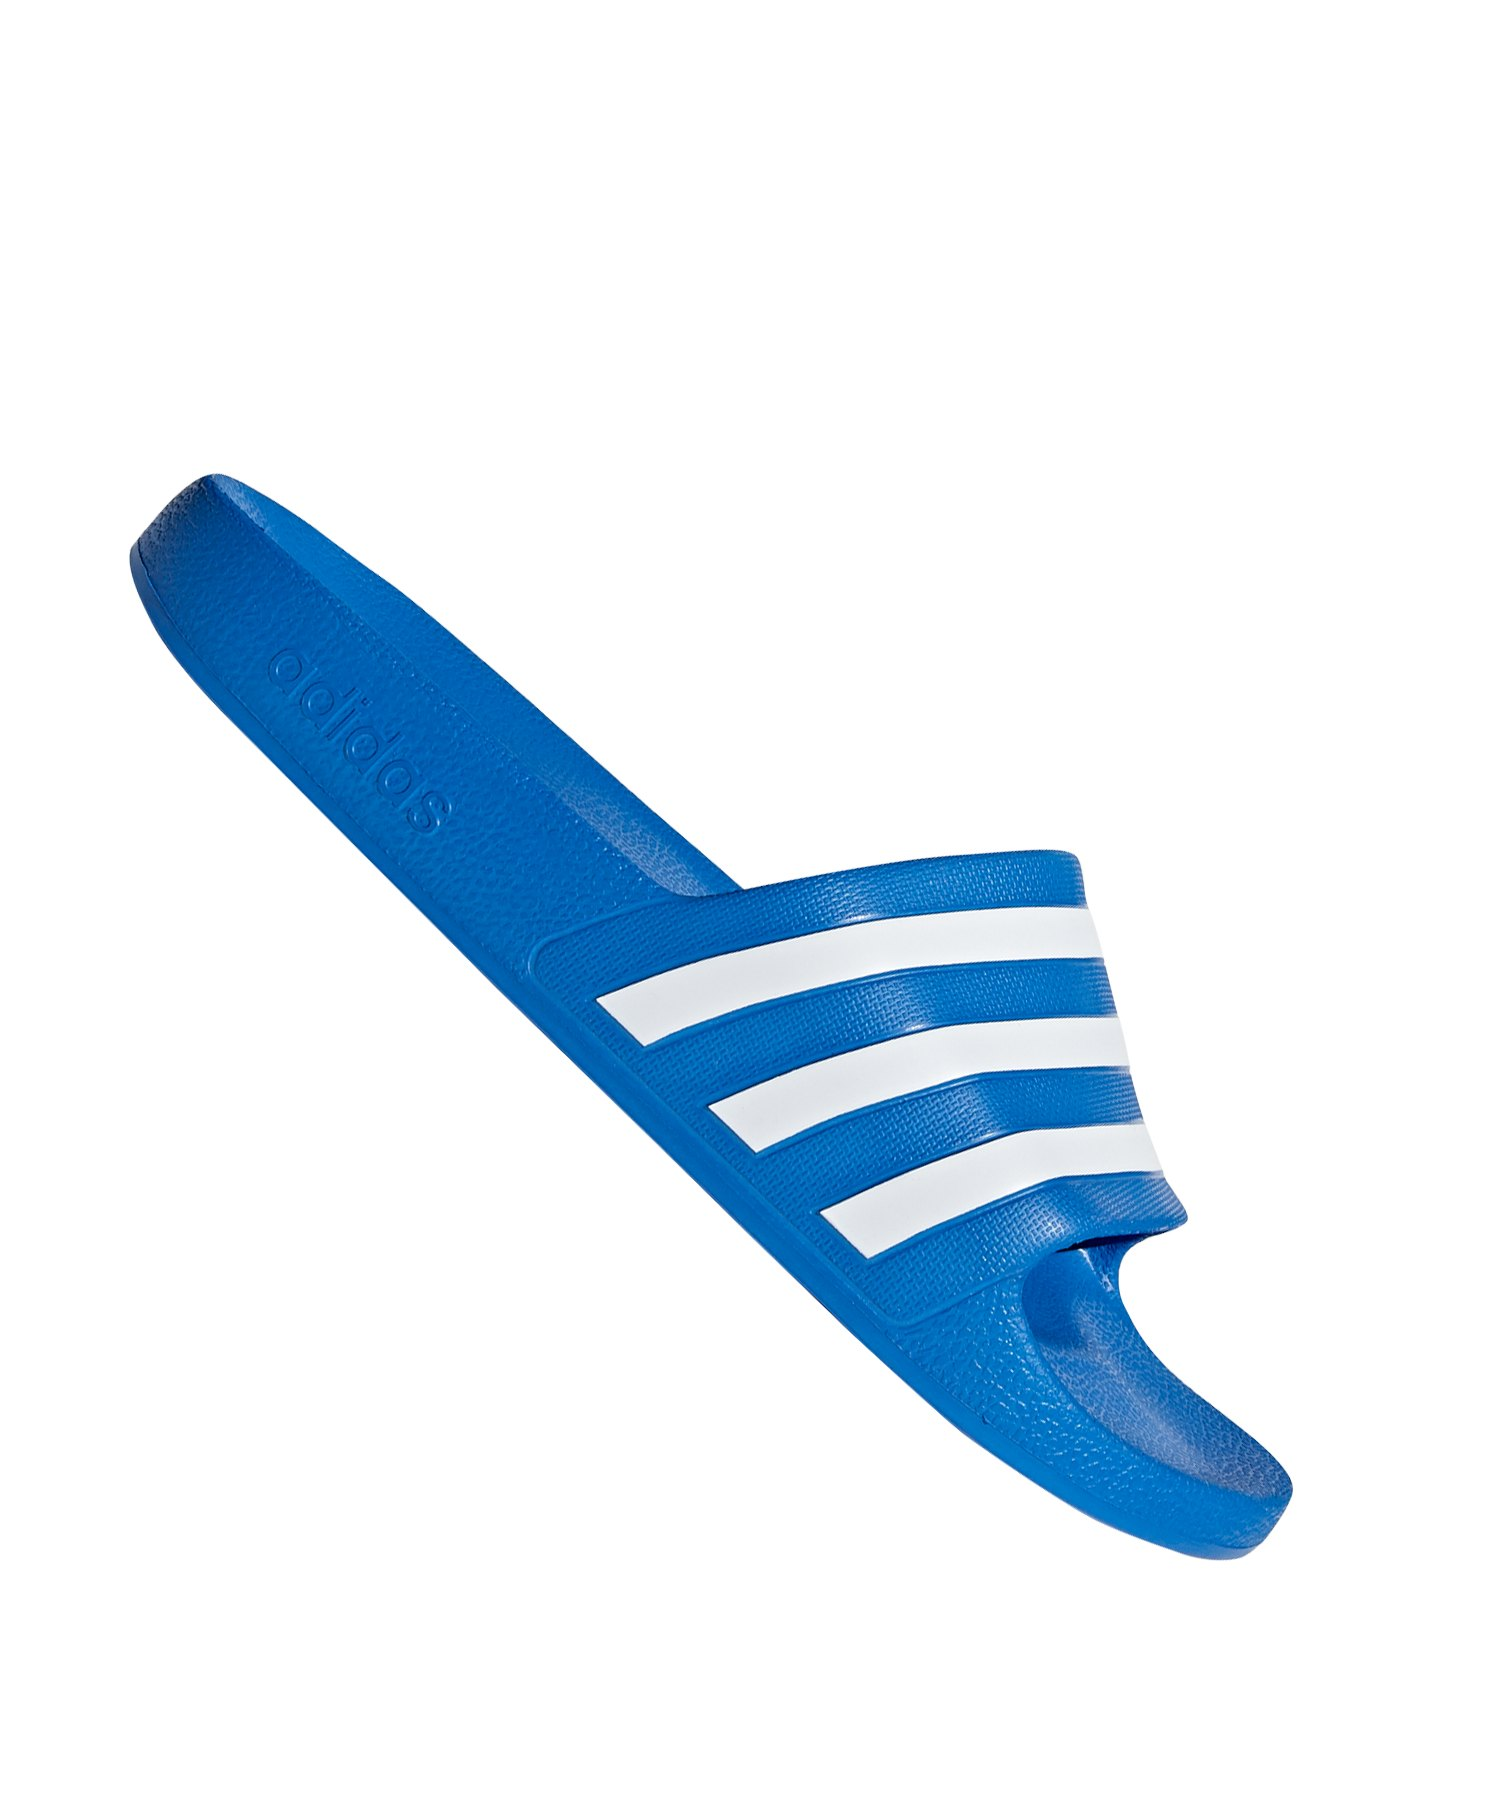 adidas Adilette Aqua Badelatsche Hellblau - blau